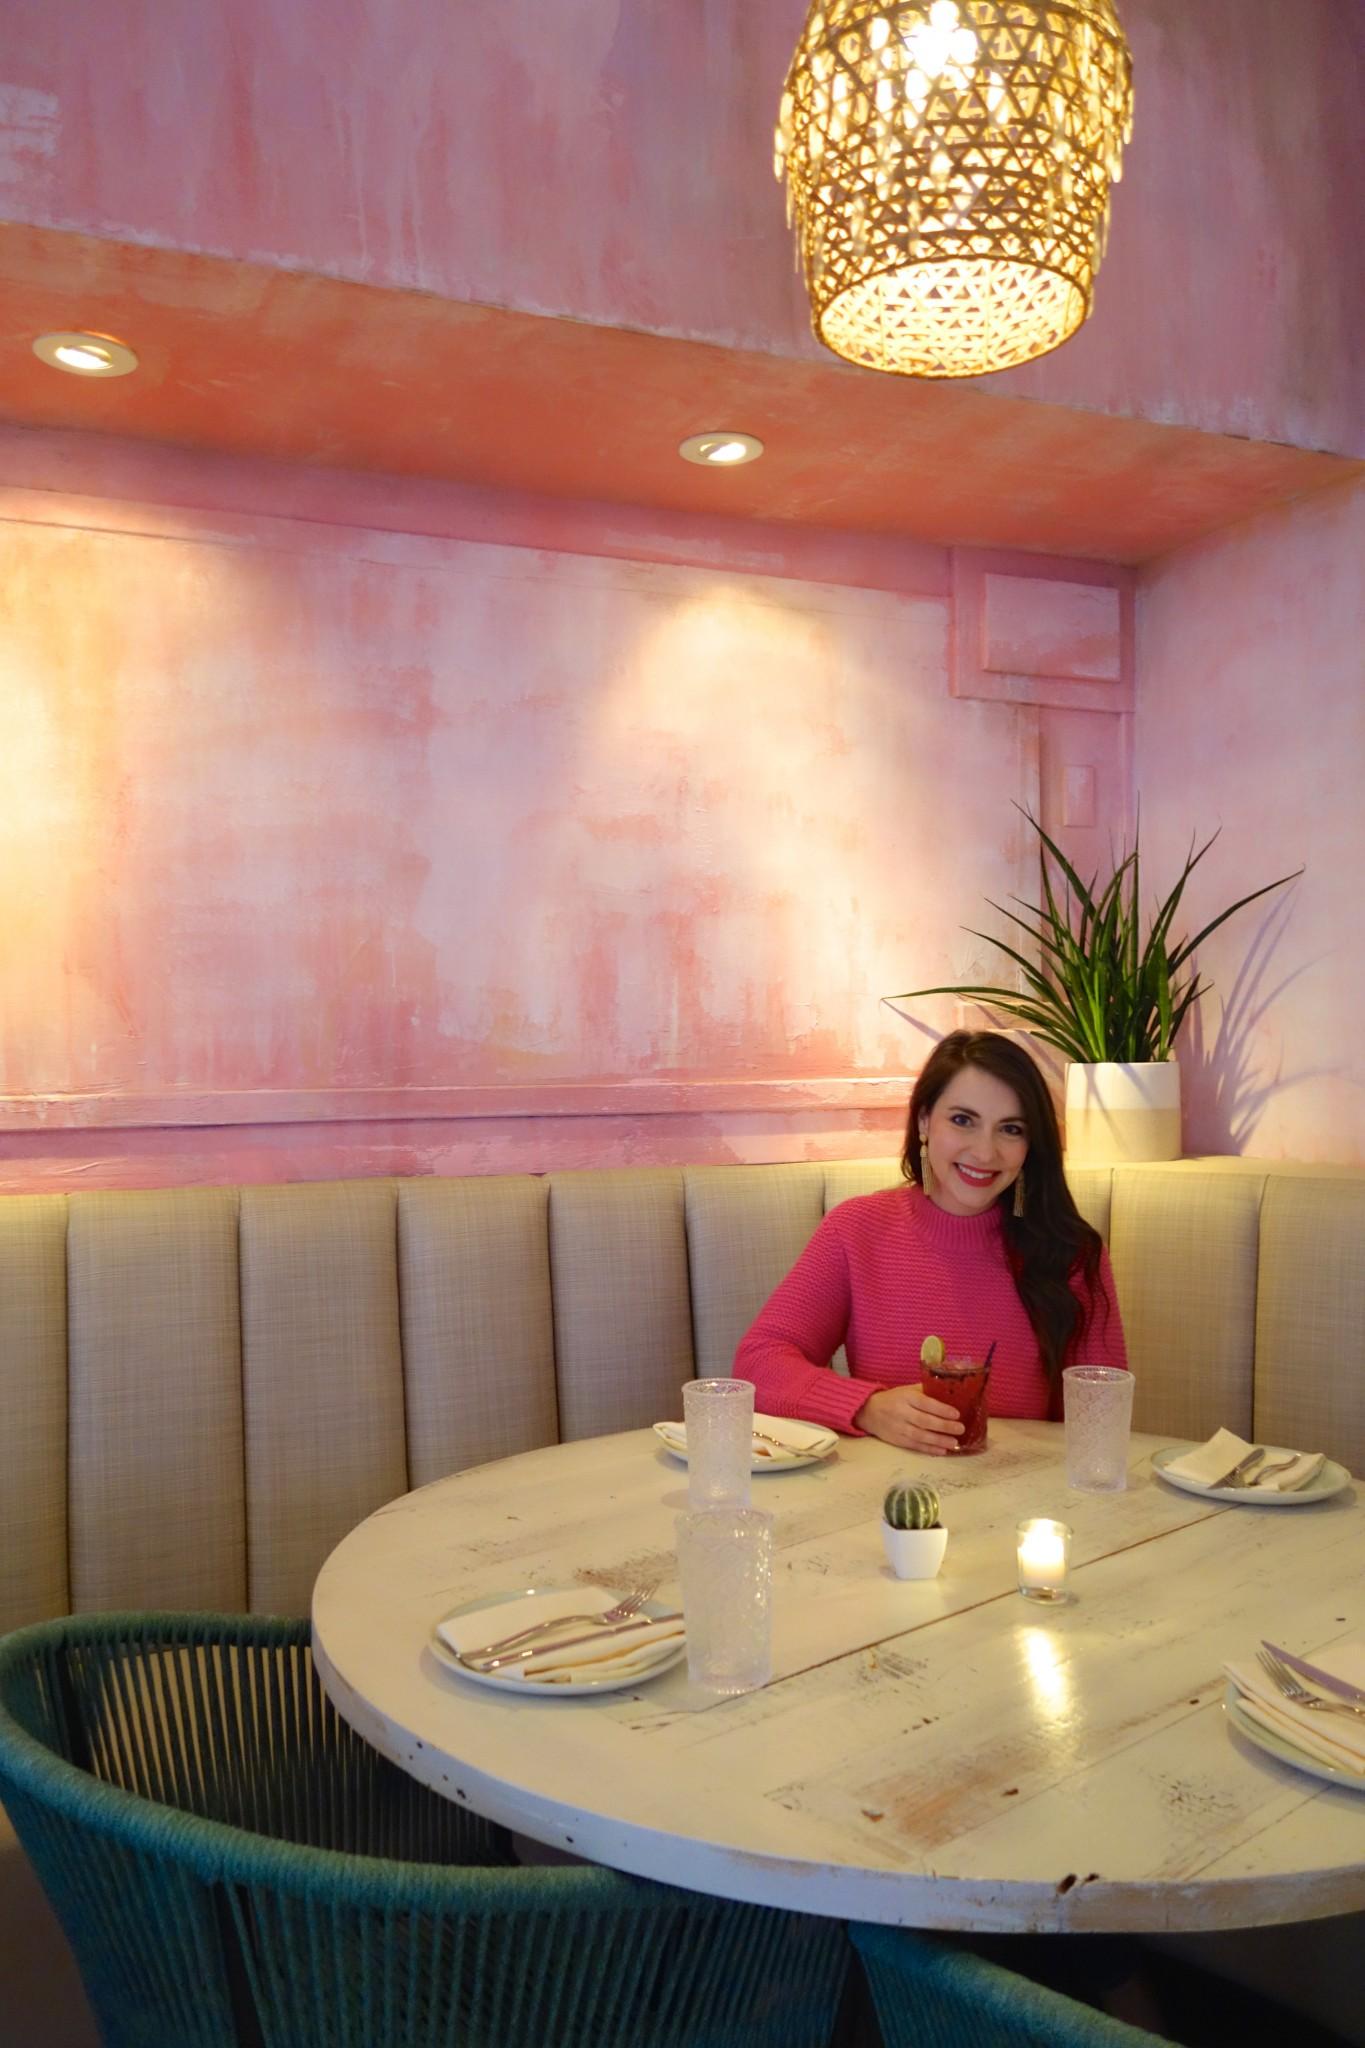 DSC02415instagrammable restaurants in boston, the-alyst.com